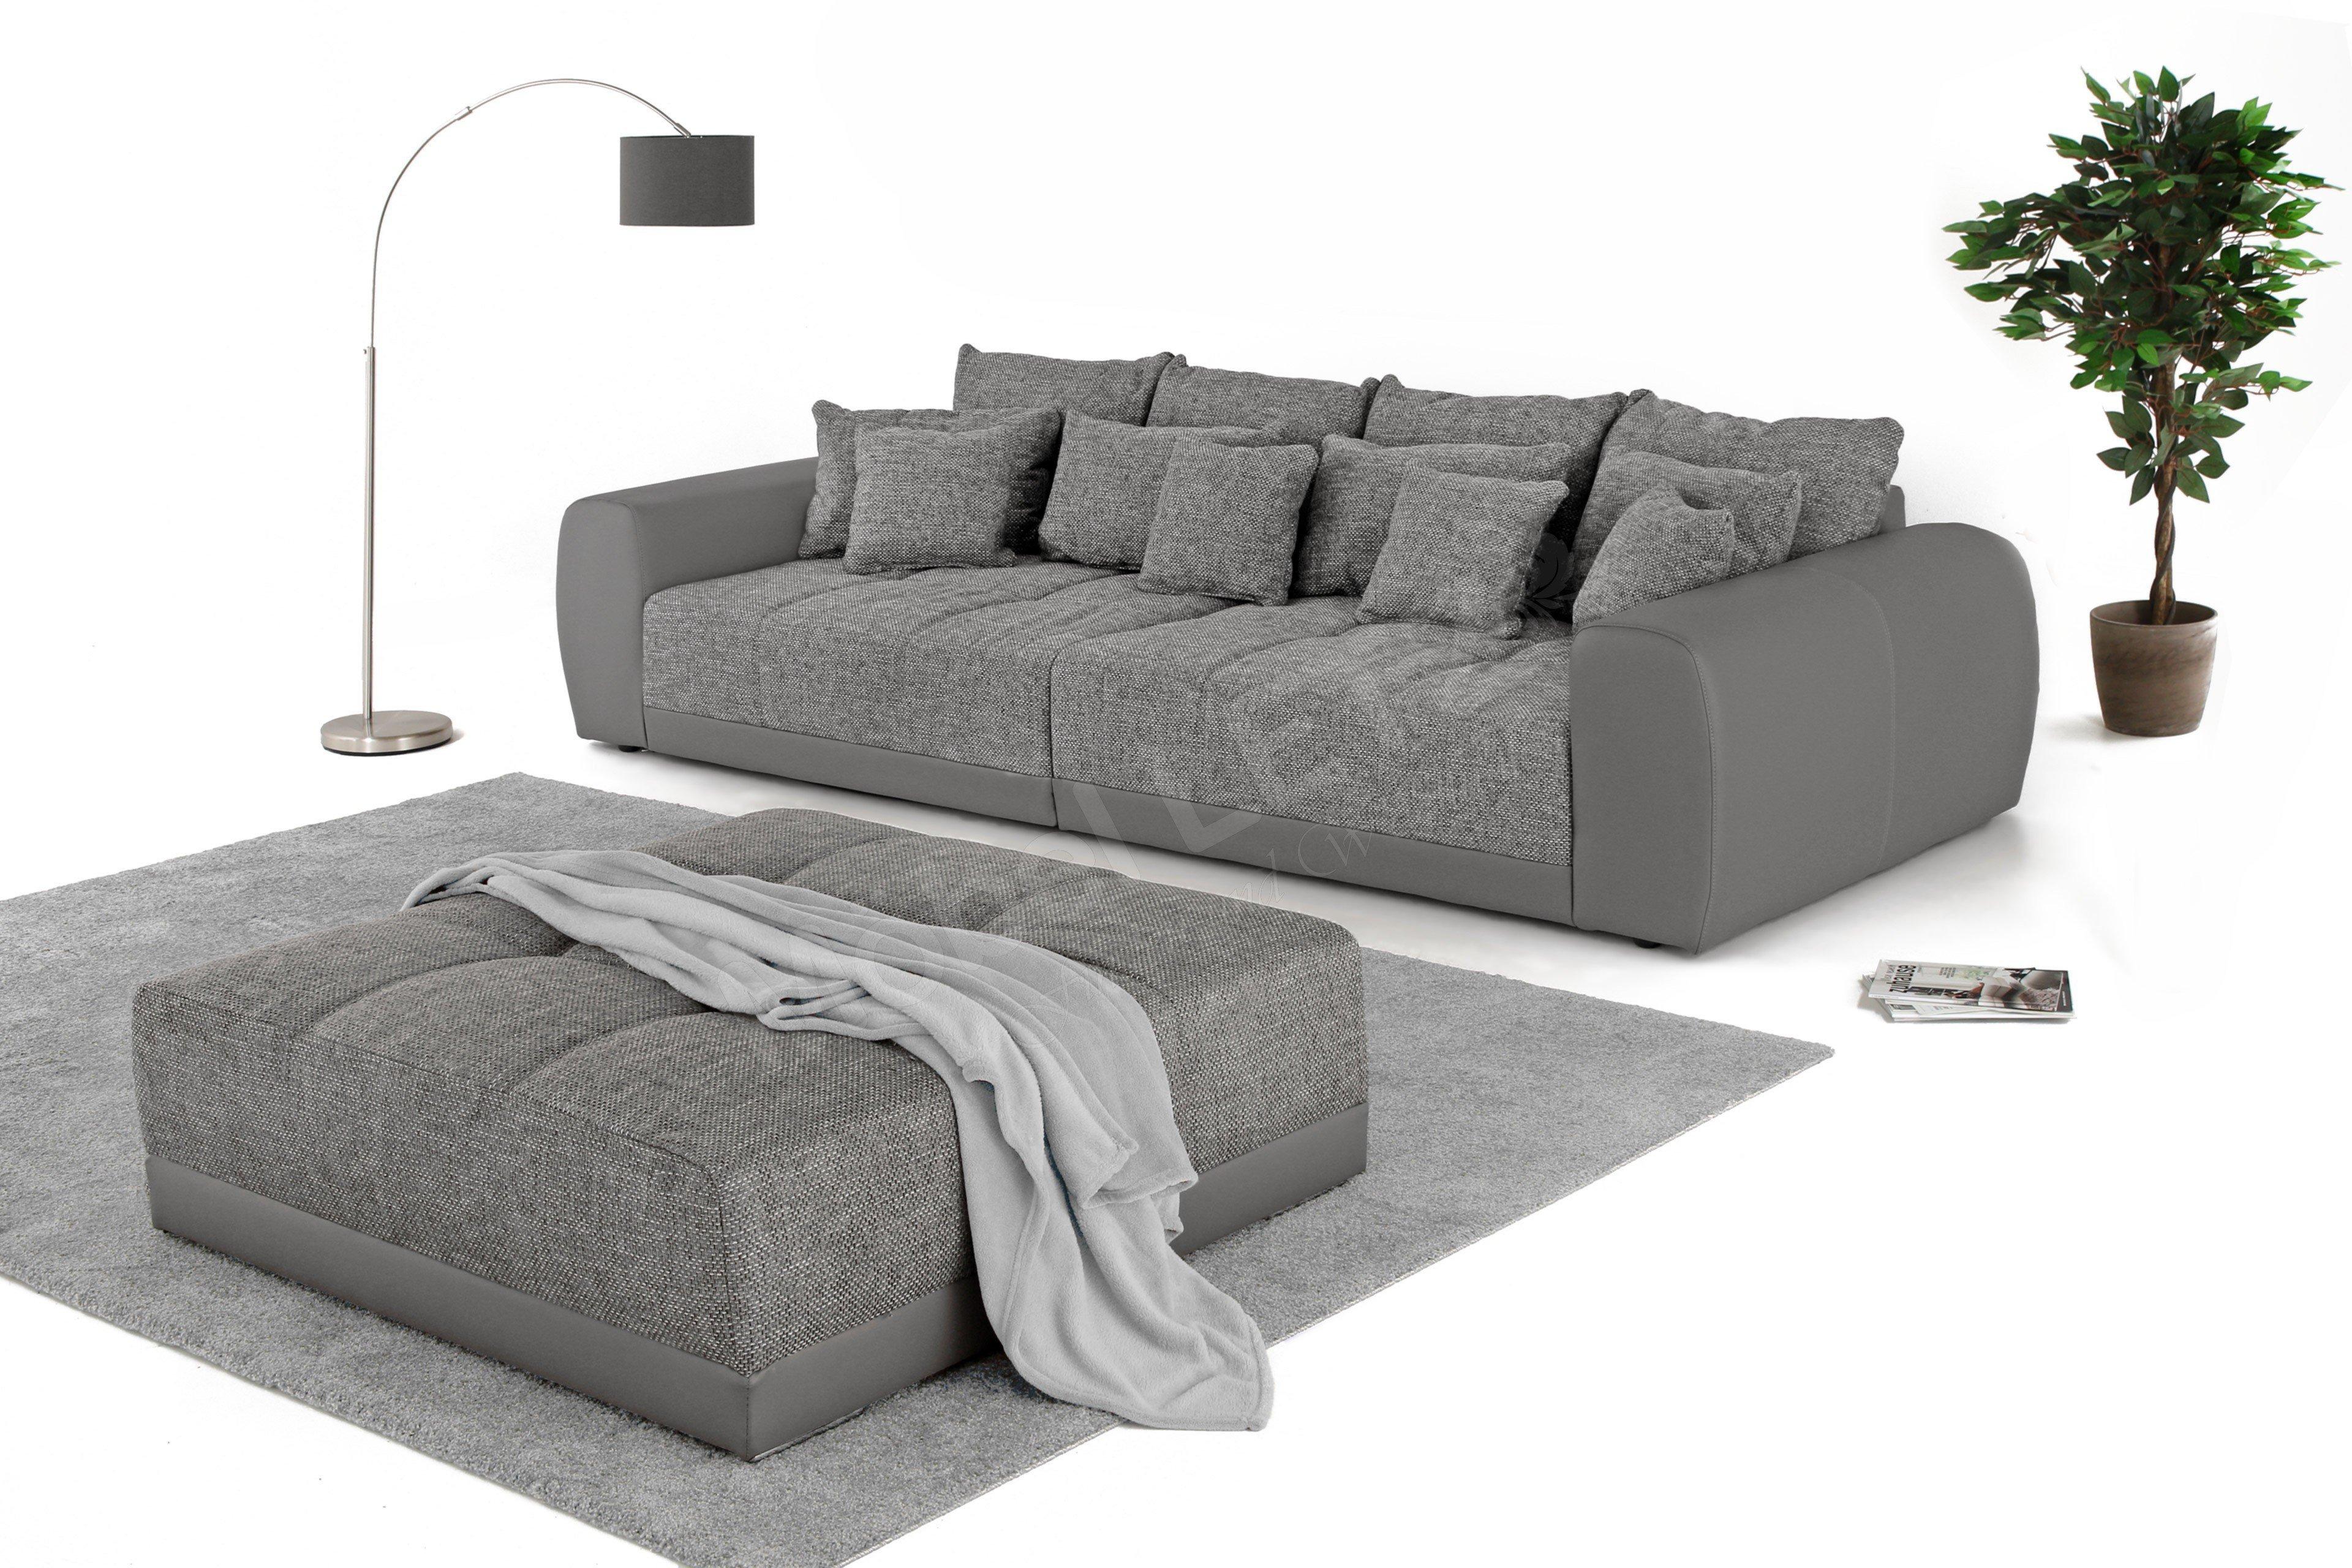 Kollektion Letz Natascha Mega Sofa Grau Möbel Letz Ihr Online Shop